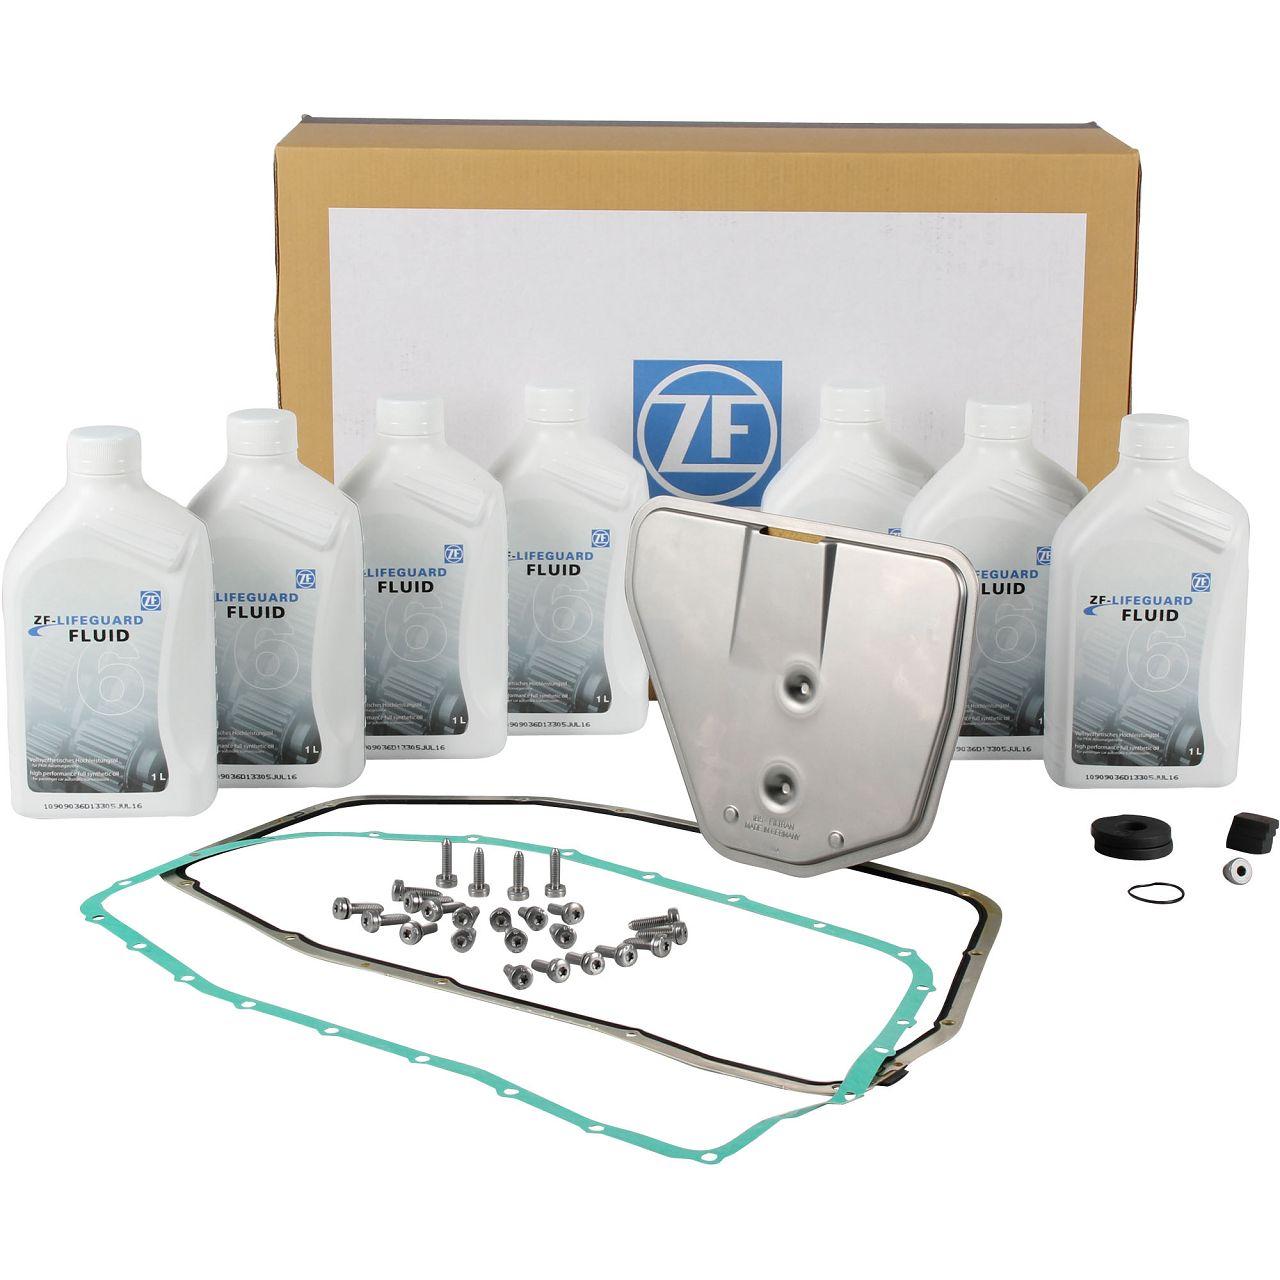 ZF Ölwechsel Satz Automatikgetriebe 6HP26 A61 für AUDI A6 4F C6 A8 4E quattro